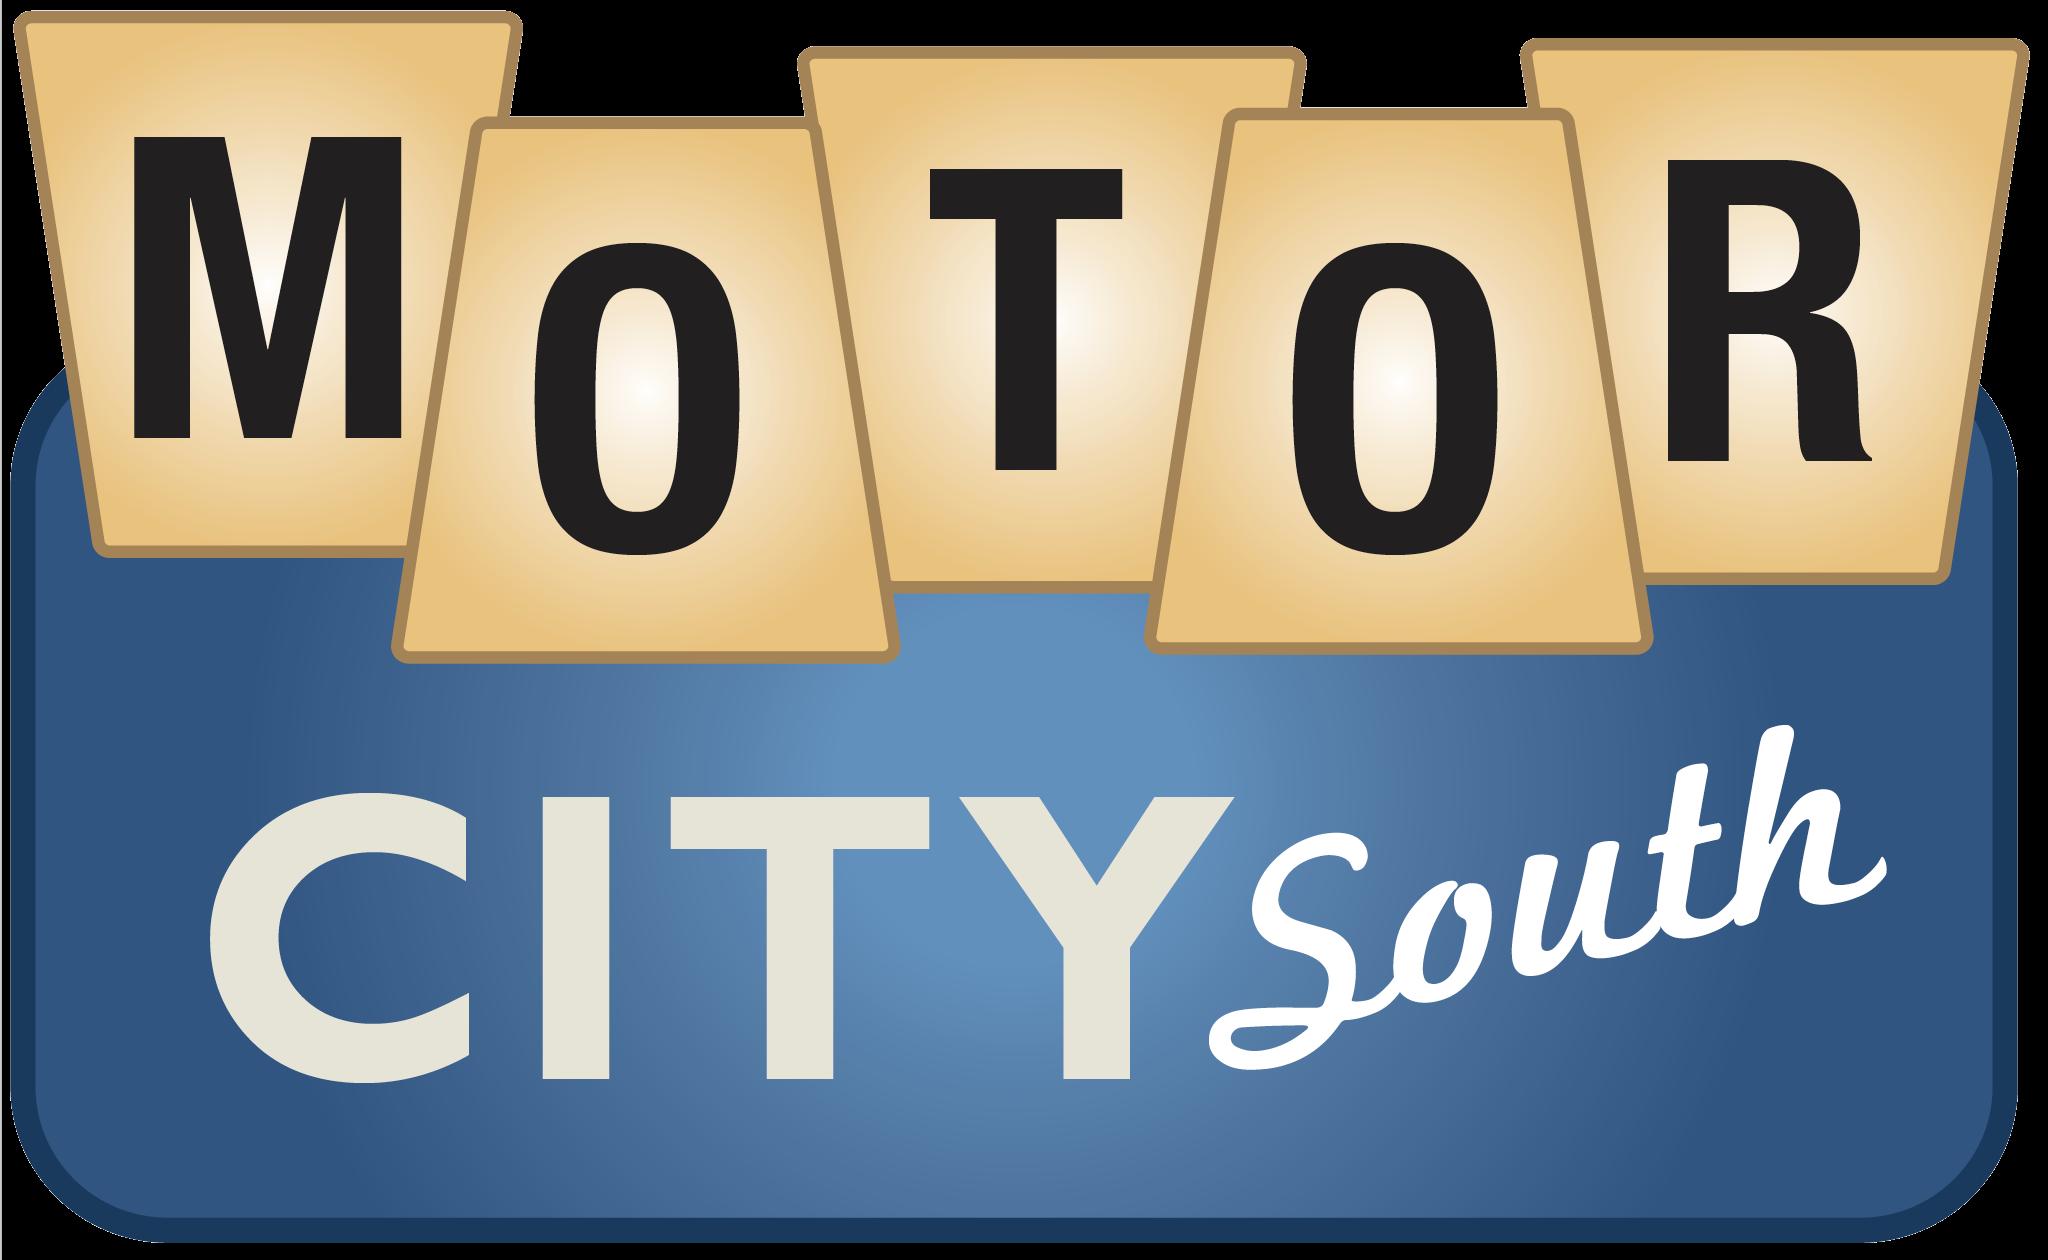 Motor City South